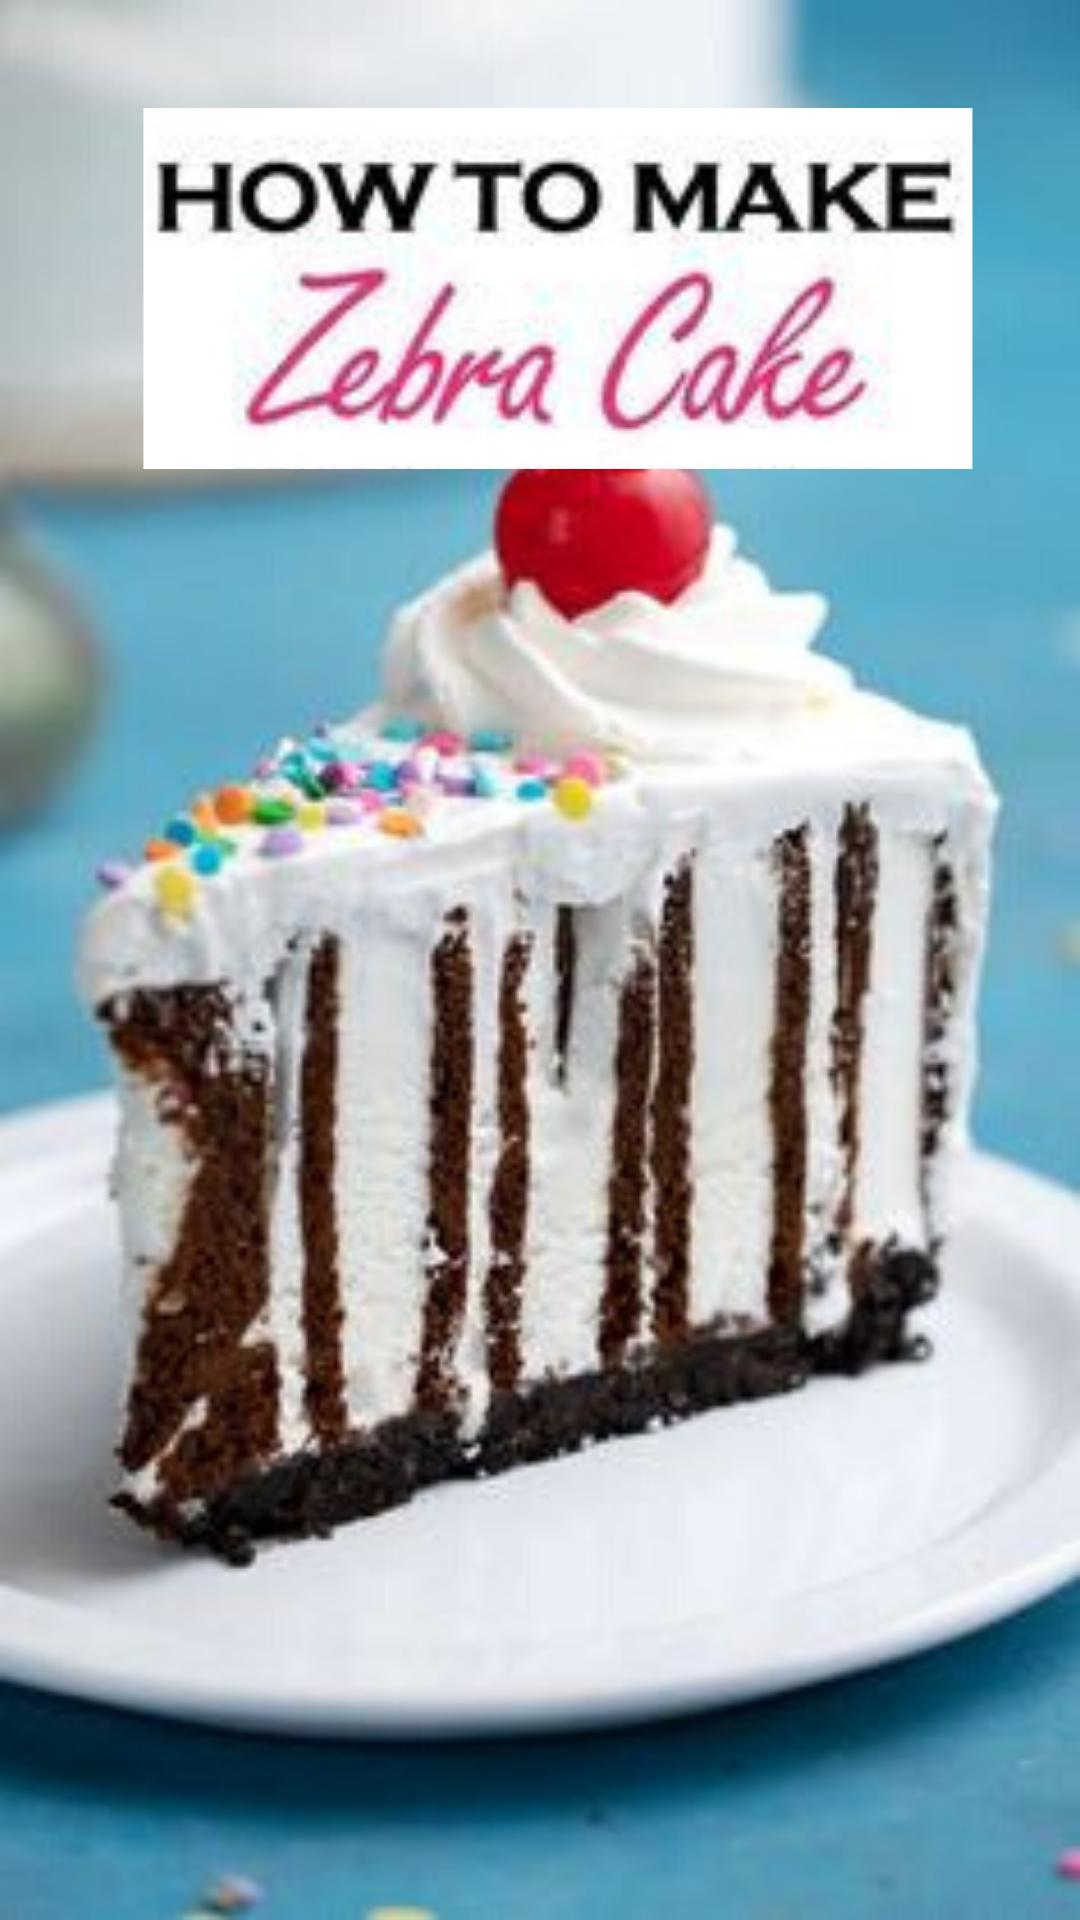 21st birthday cake for girls turning 21